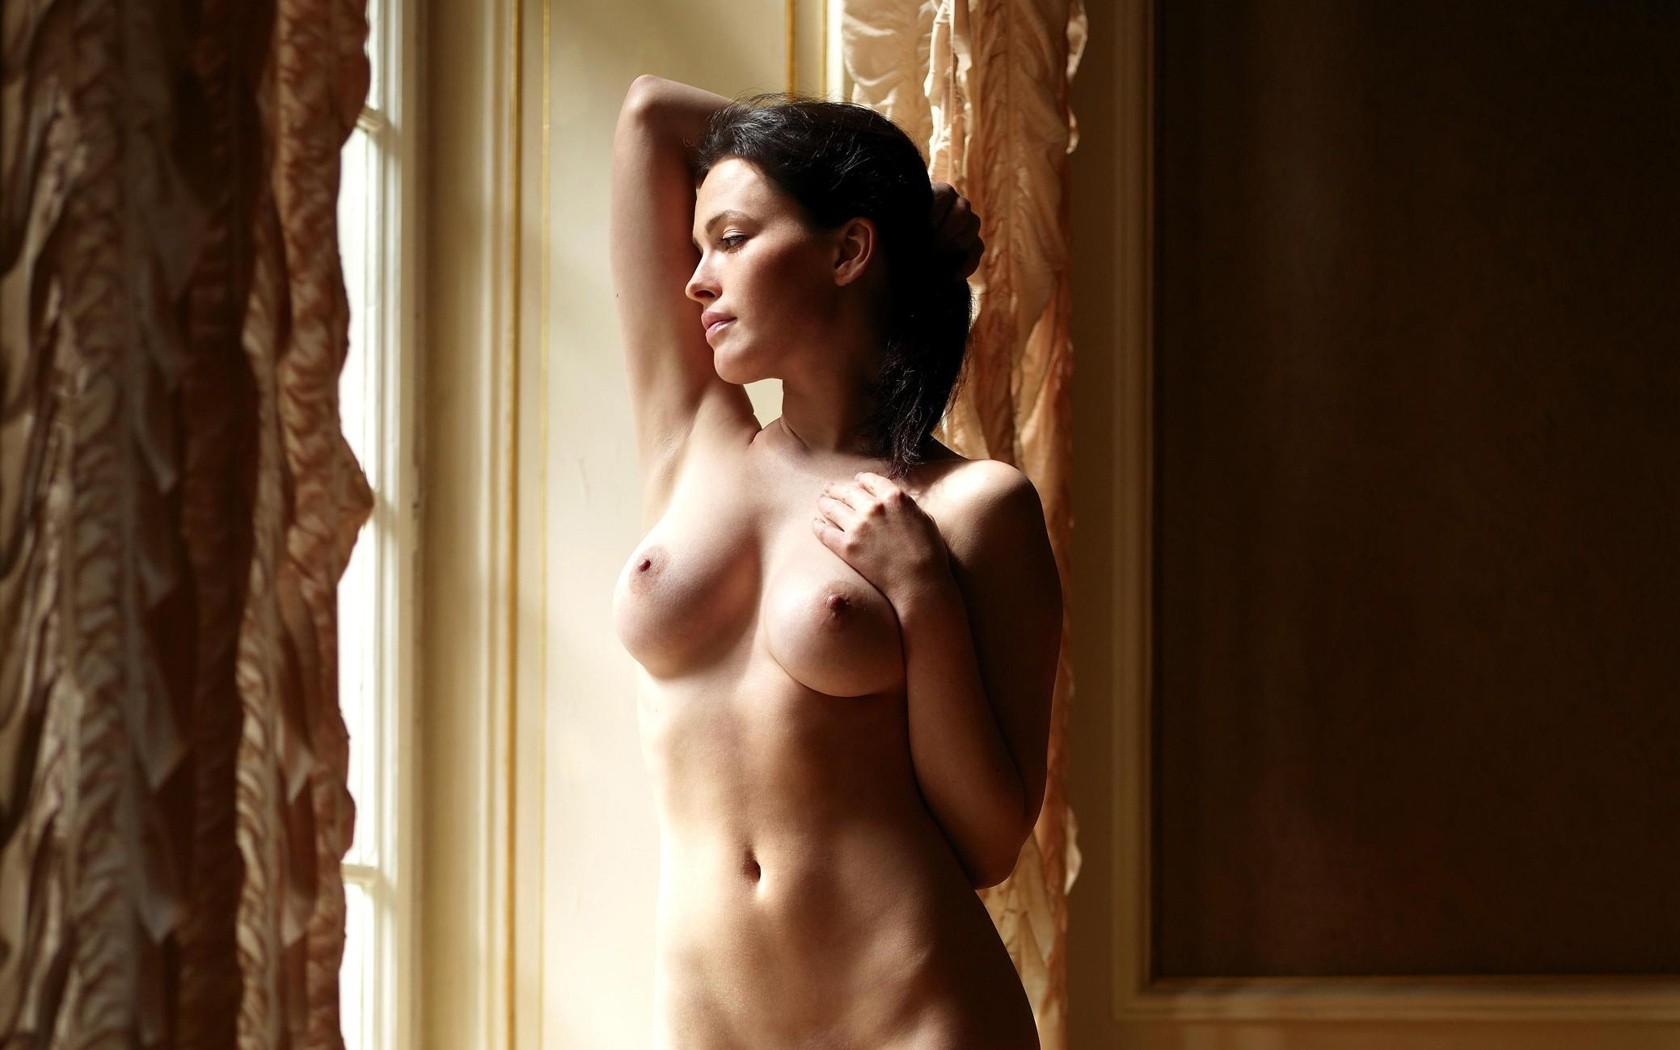 xxx-naked-give-kornakova-naked-losing-your-virginity